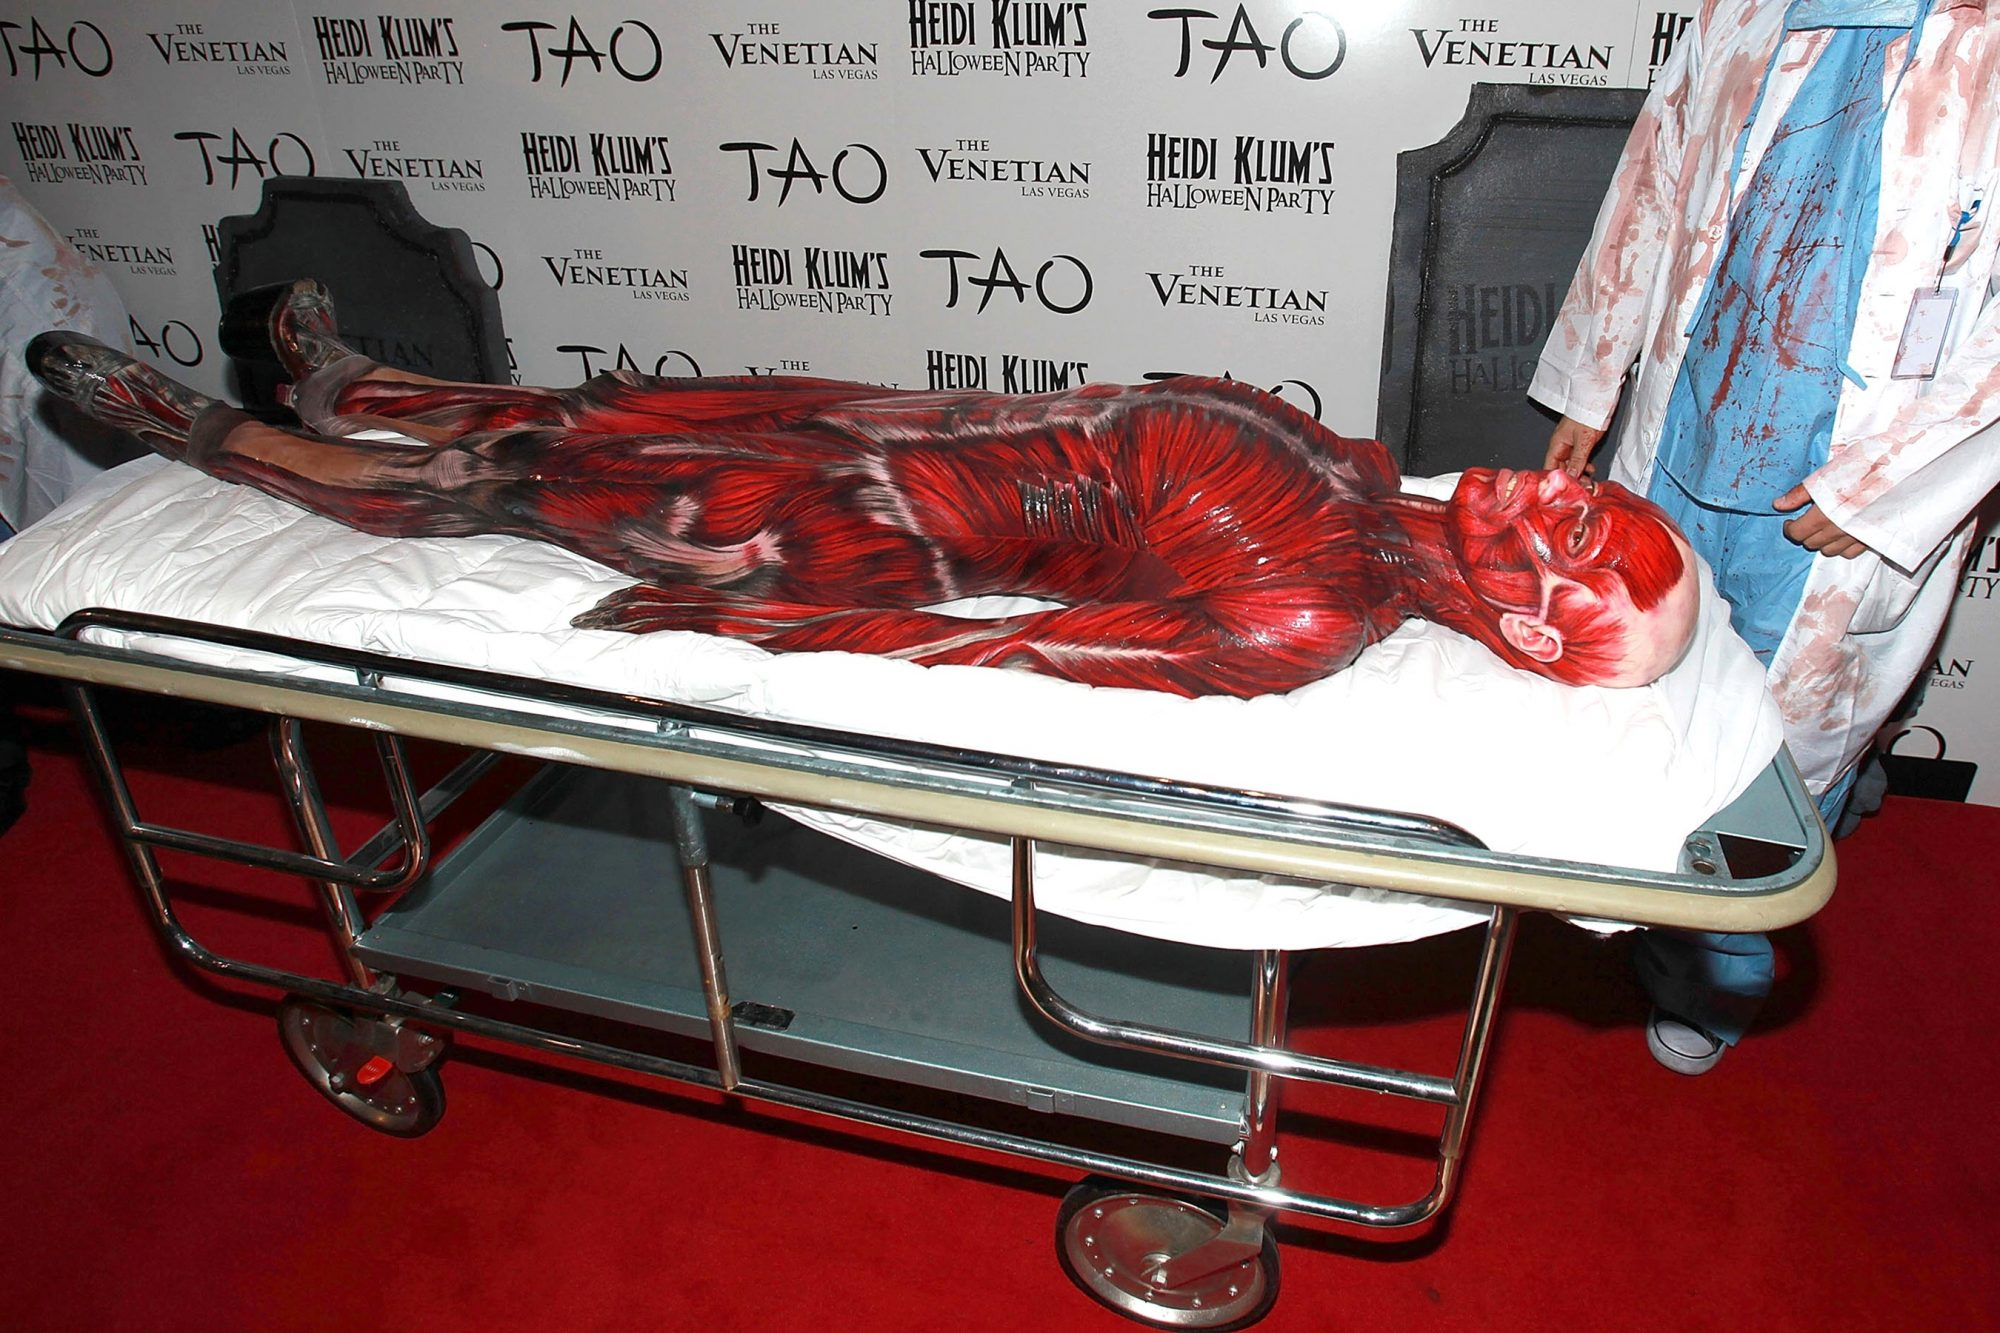 Heidi Klum's 12th Annual Halloween Party at TAO Las Vegas at the Venetian